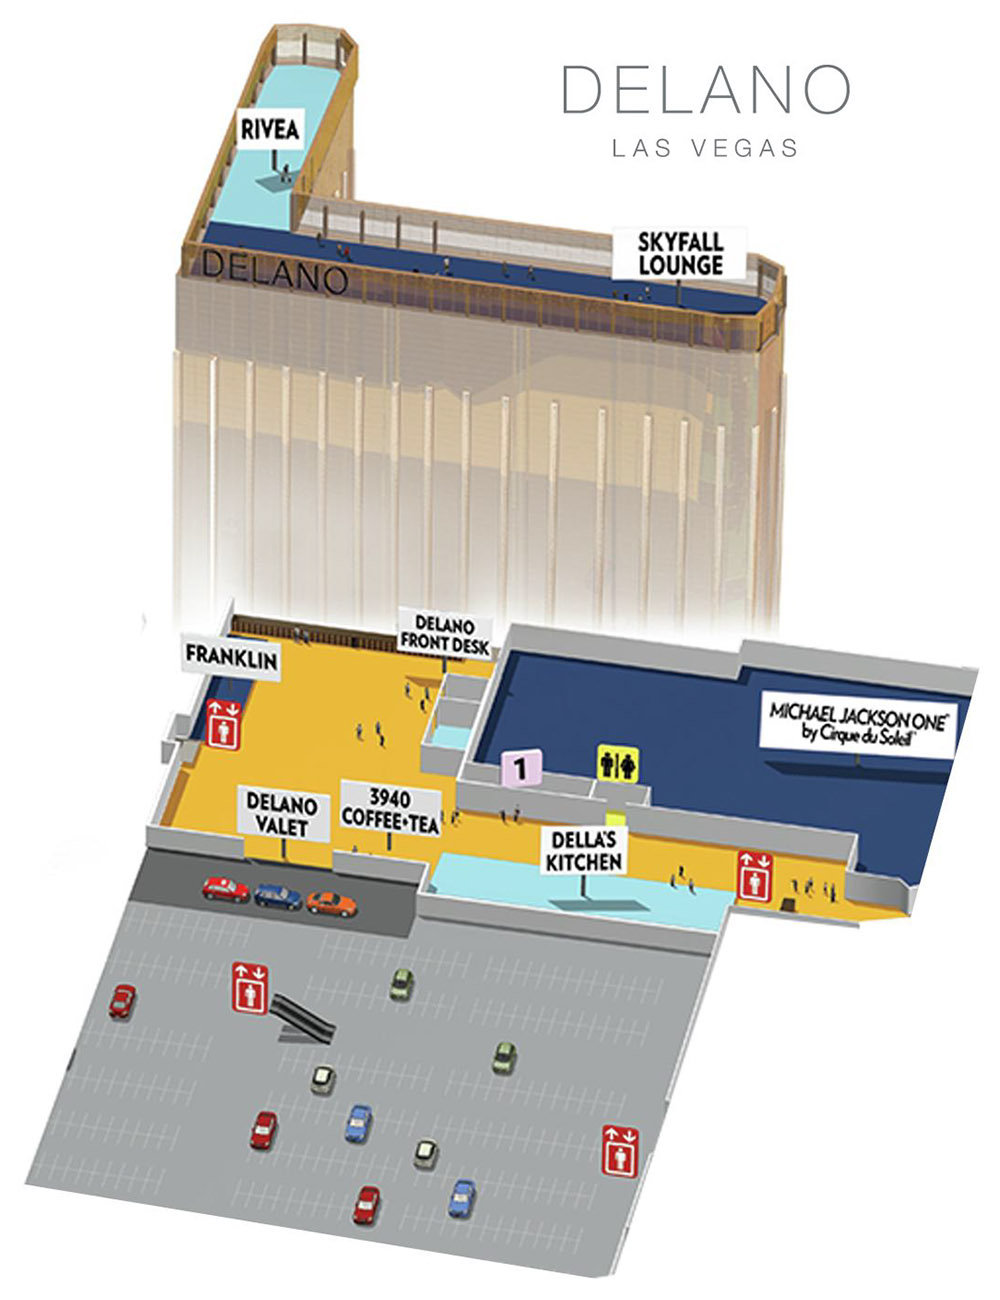 Delano Casino Property Map Amp Floor Plans Las Vegas